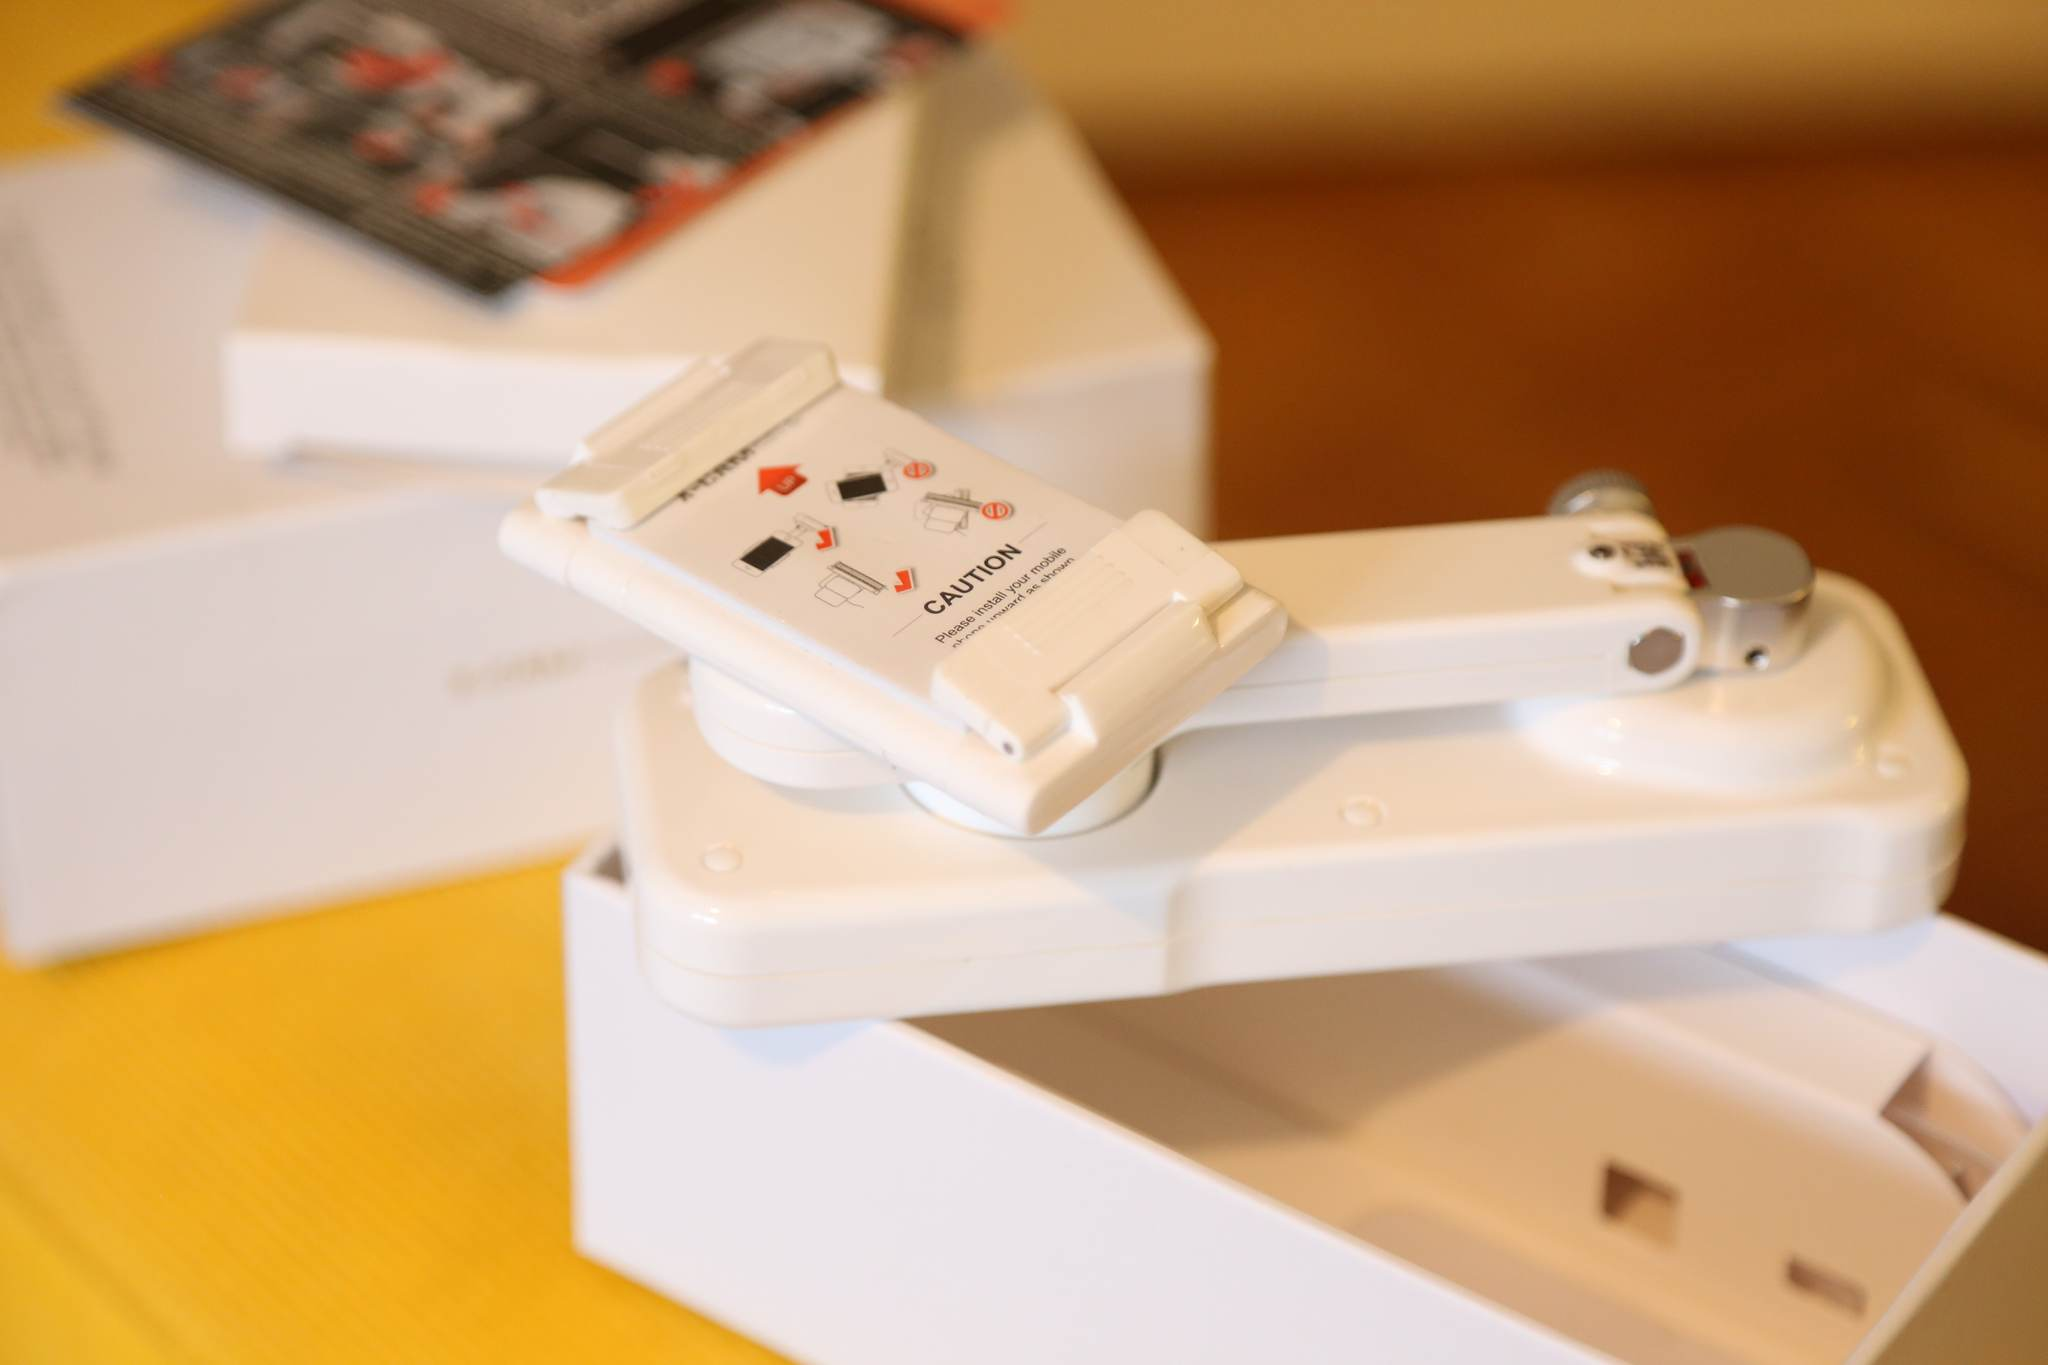 x-cam-sight2-2-tengelyes-telefon-mobiltelefon-gimbal-teszt-olcso-kepstabilizalas-mobil-kamera-2-axis-stabilizer-bluetooth-self-timer-brushless-handheld-gimbal-03.jpg